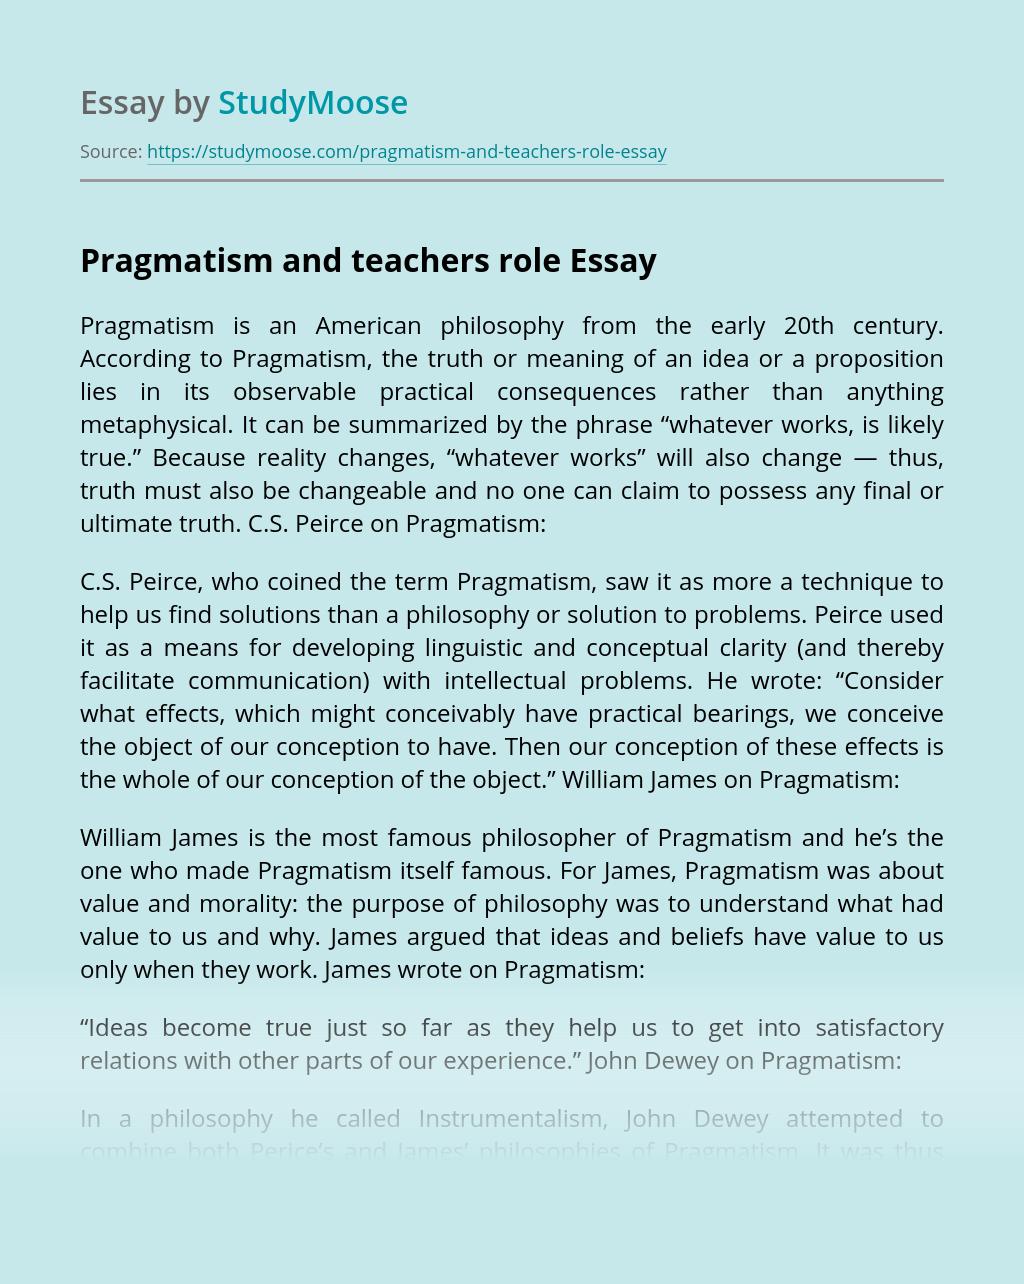 Pragmatism and teachers role